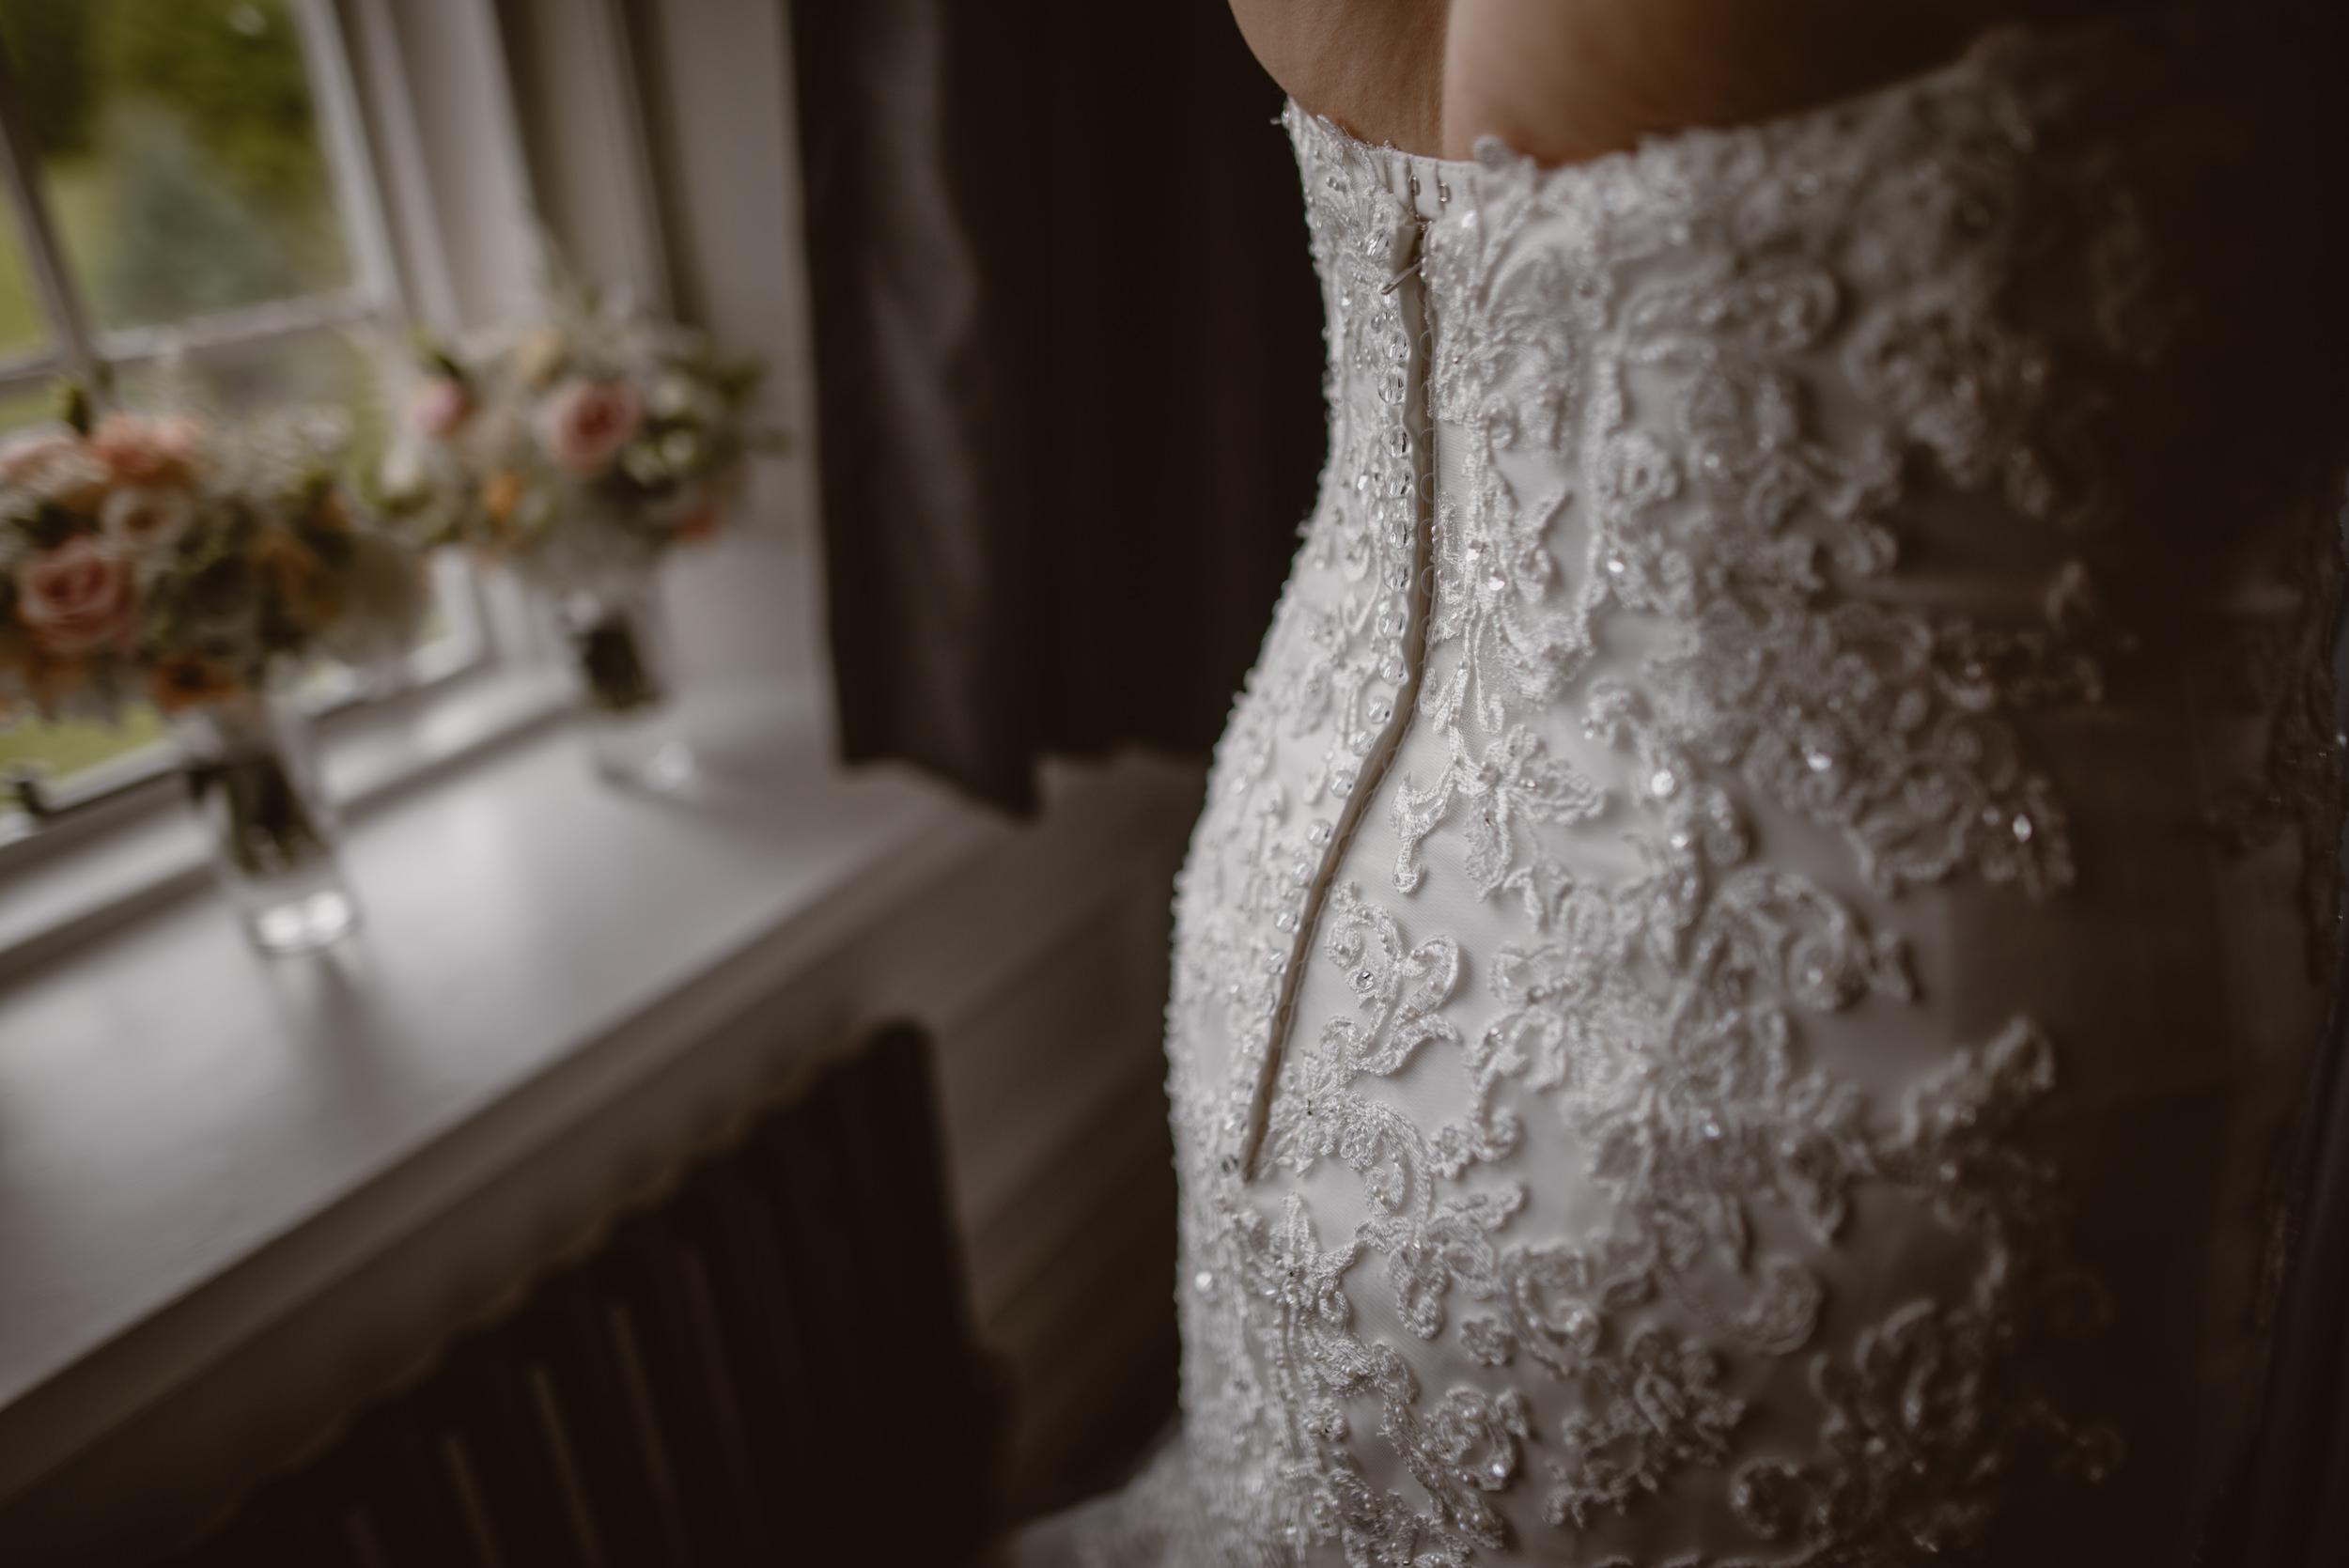 Rachel-and-James-Wedding-Horsley-Towers-State-Manu-Mendoza-Wedding-Photography-170.jpg